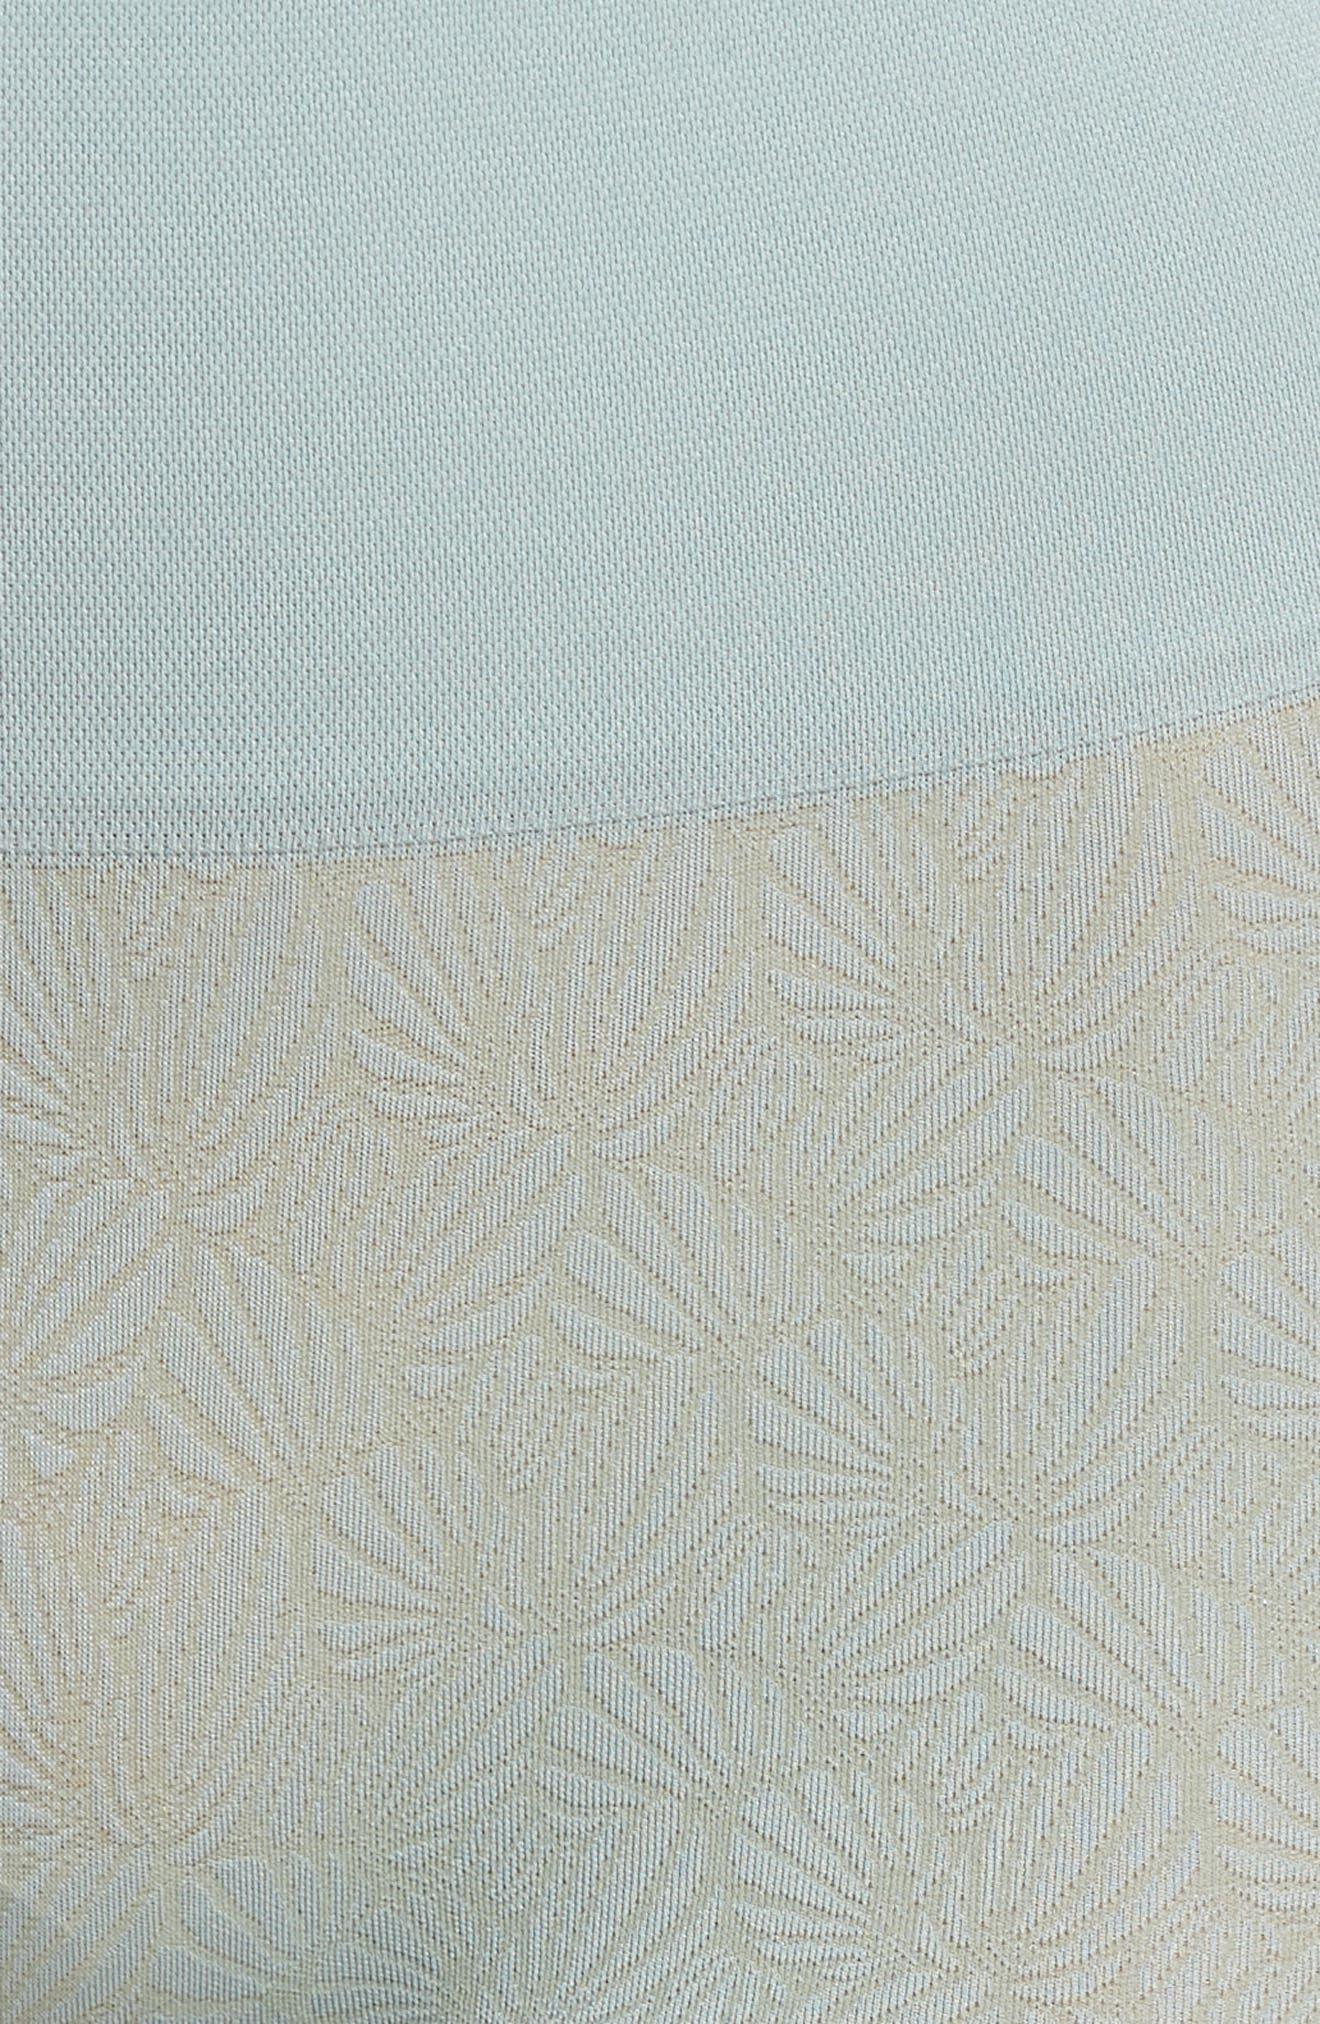 Ultralight Seamless Shaping Shorts,                             Alternate thumbnail 5, color,                             SILVER BLUE